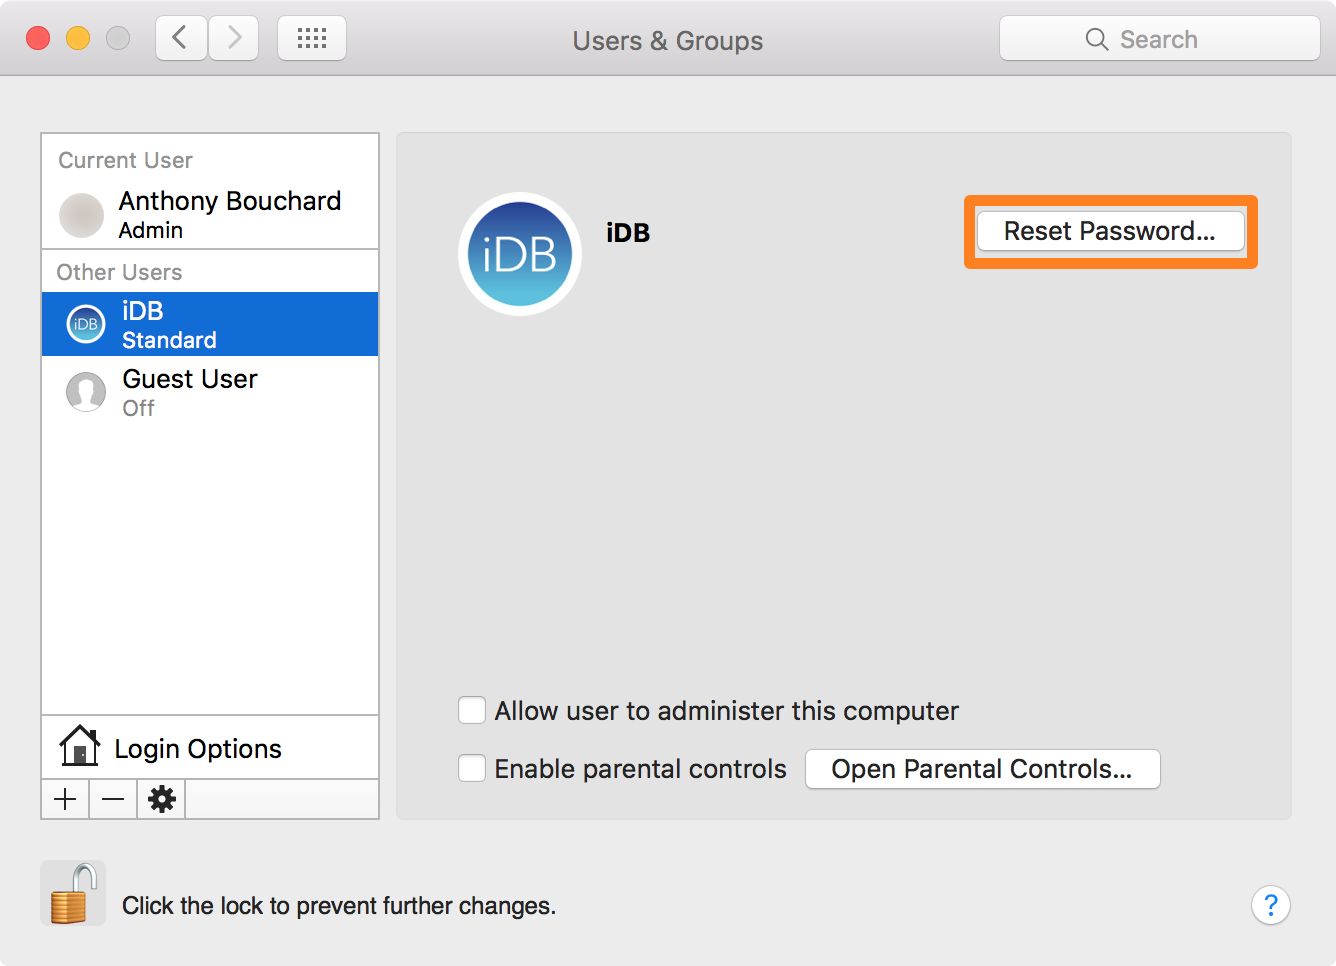 Reset Account Password in OS X